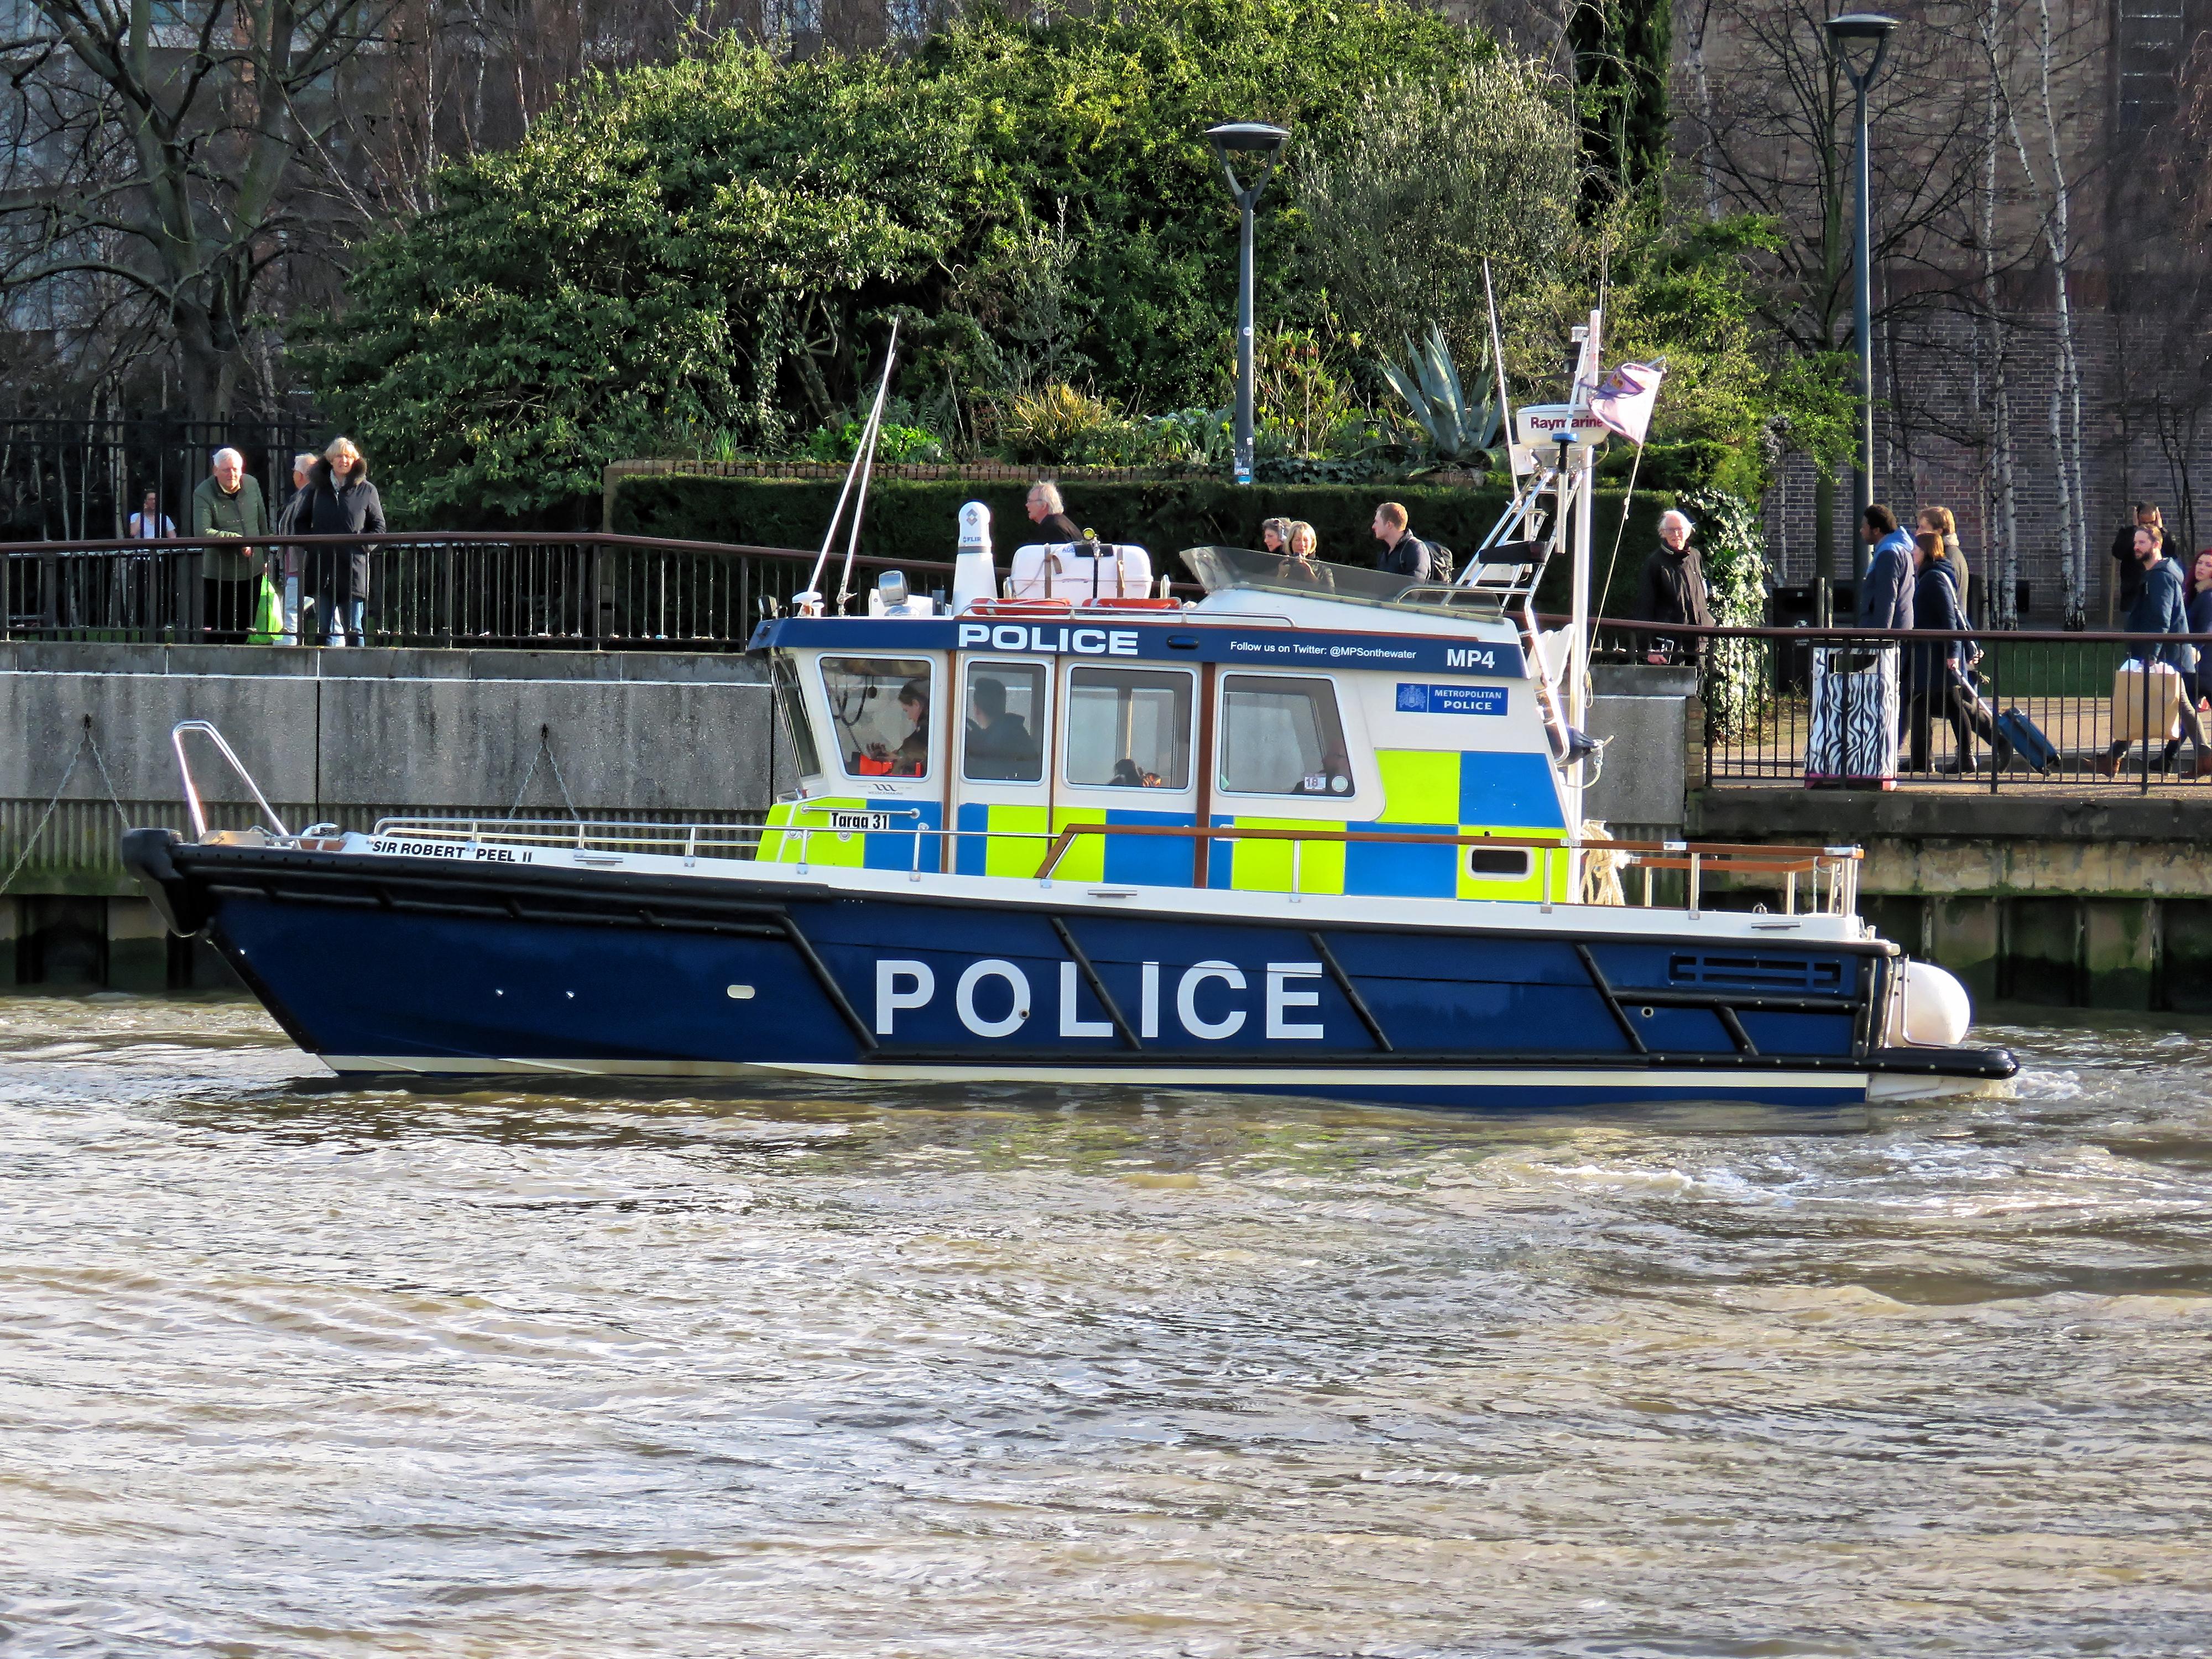 robert peel metropolitan police